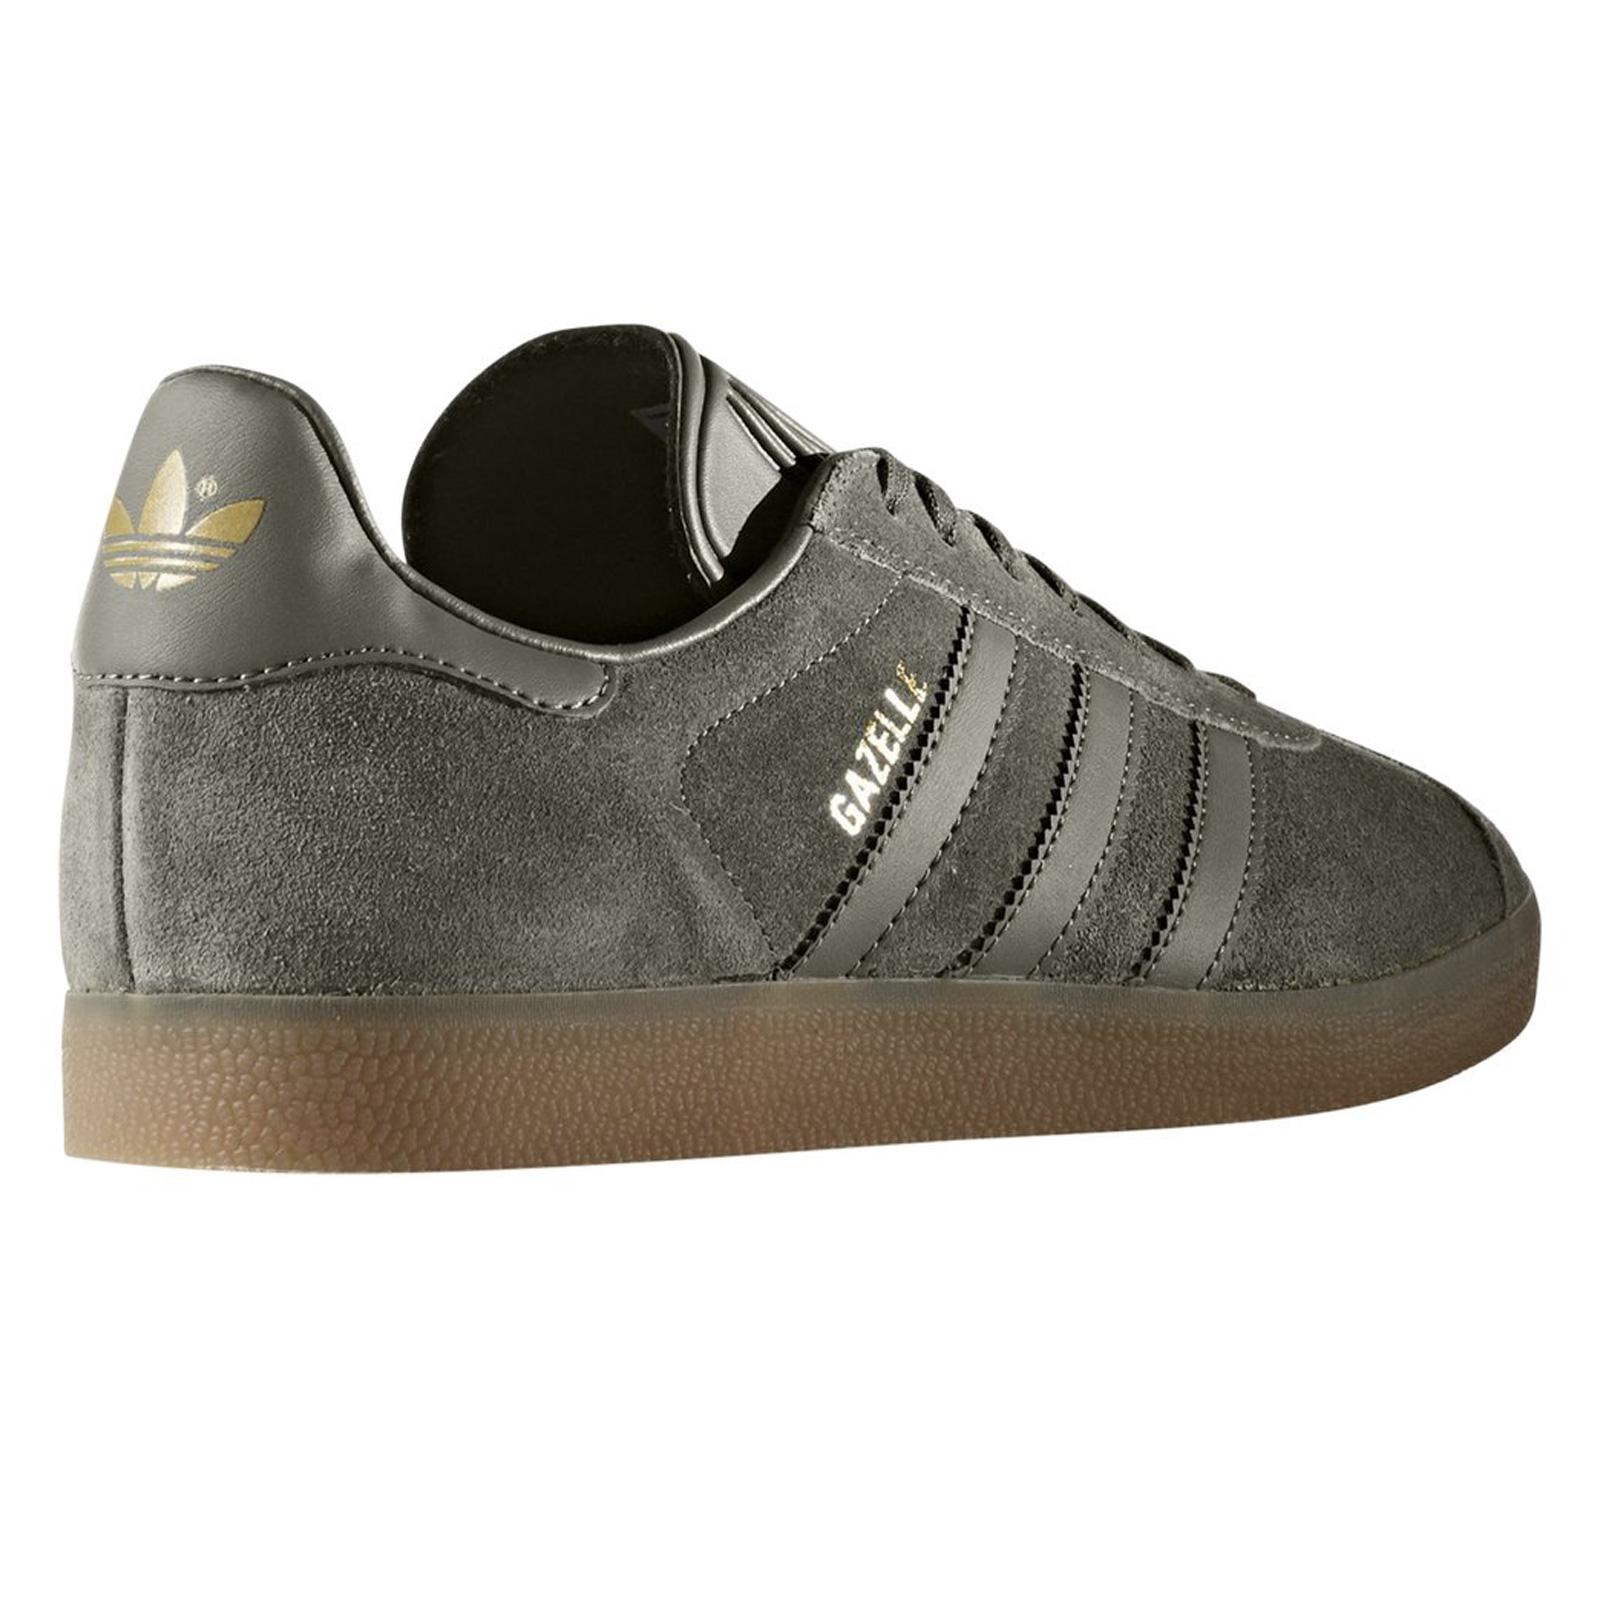 adidas Originals Gazelle Damen Sneaker Leder Turnschuhe Utility Grey Grau BB2754